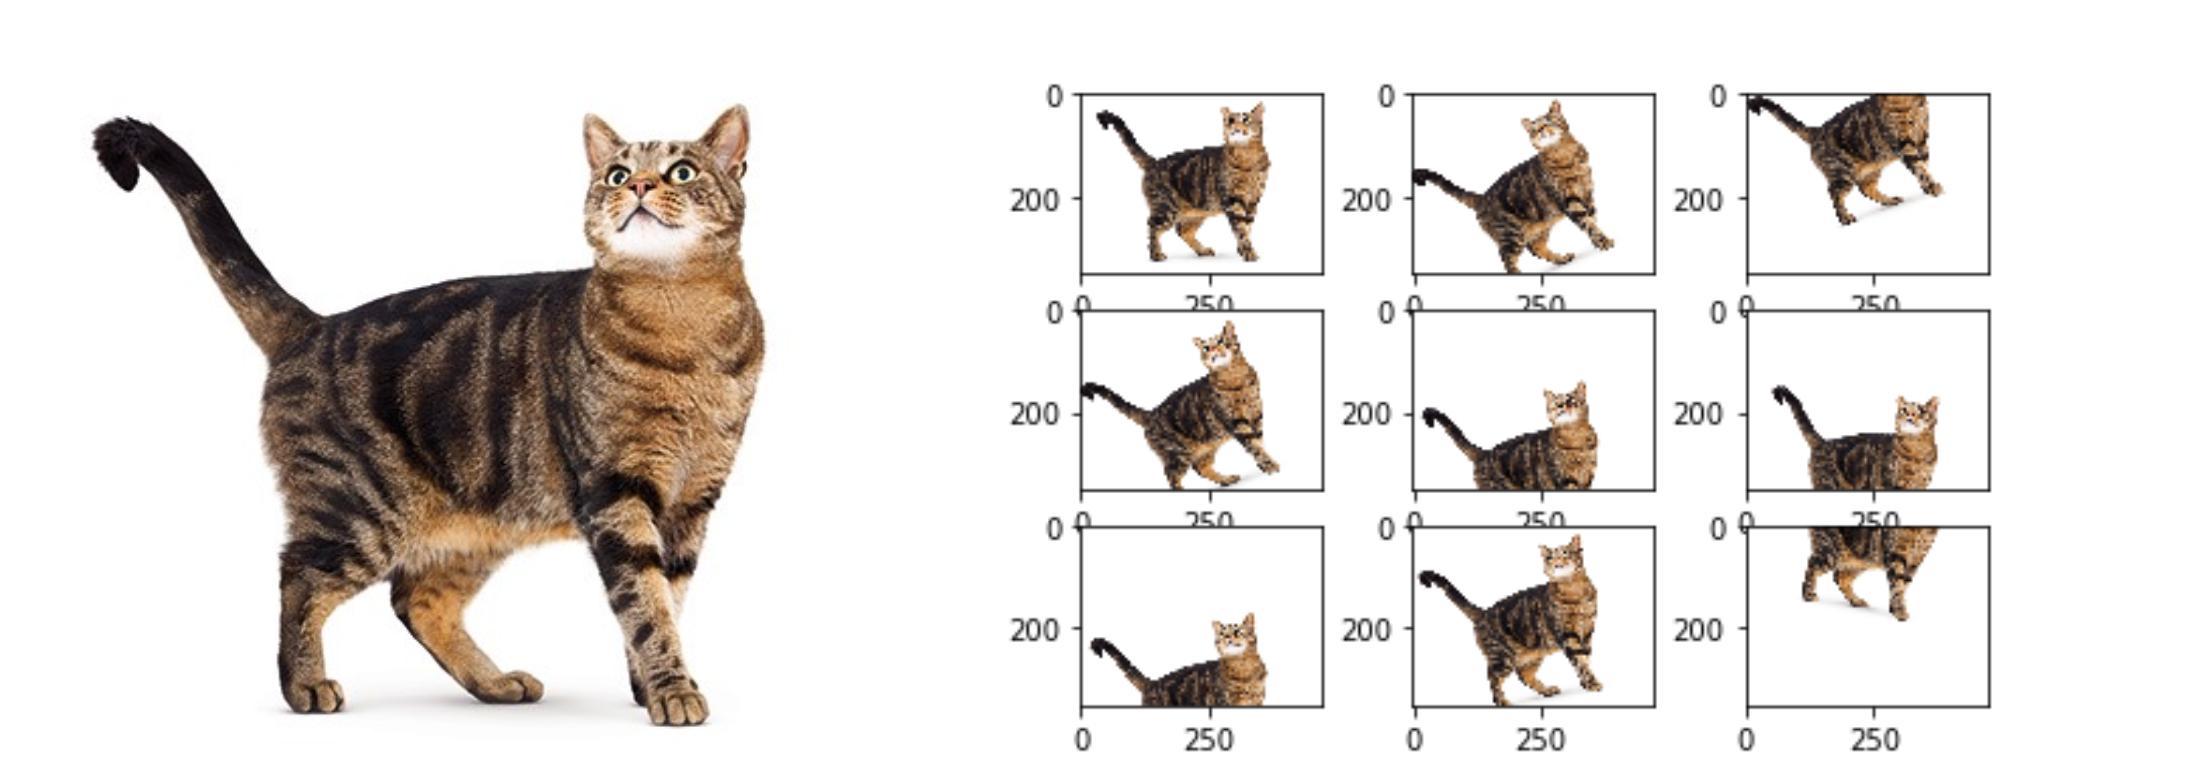 image data augmentation